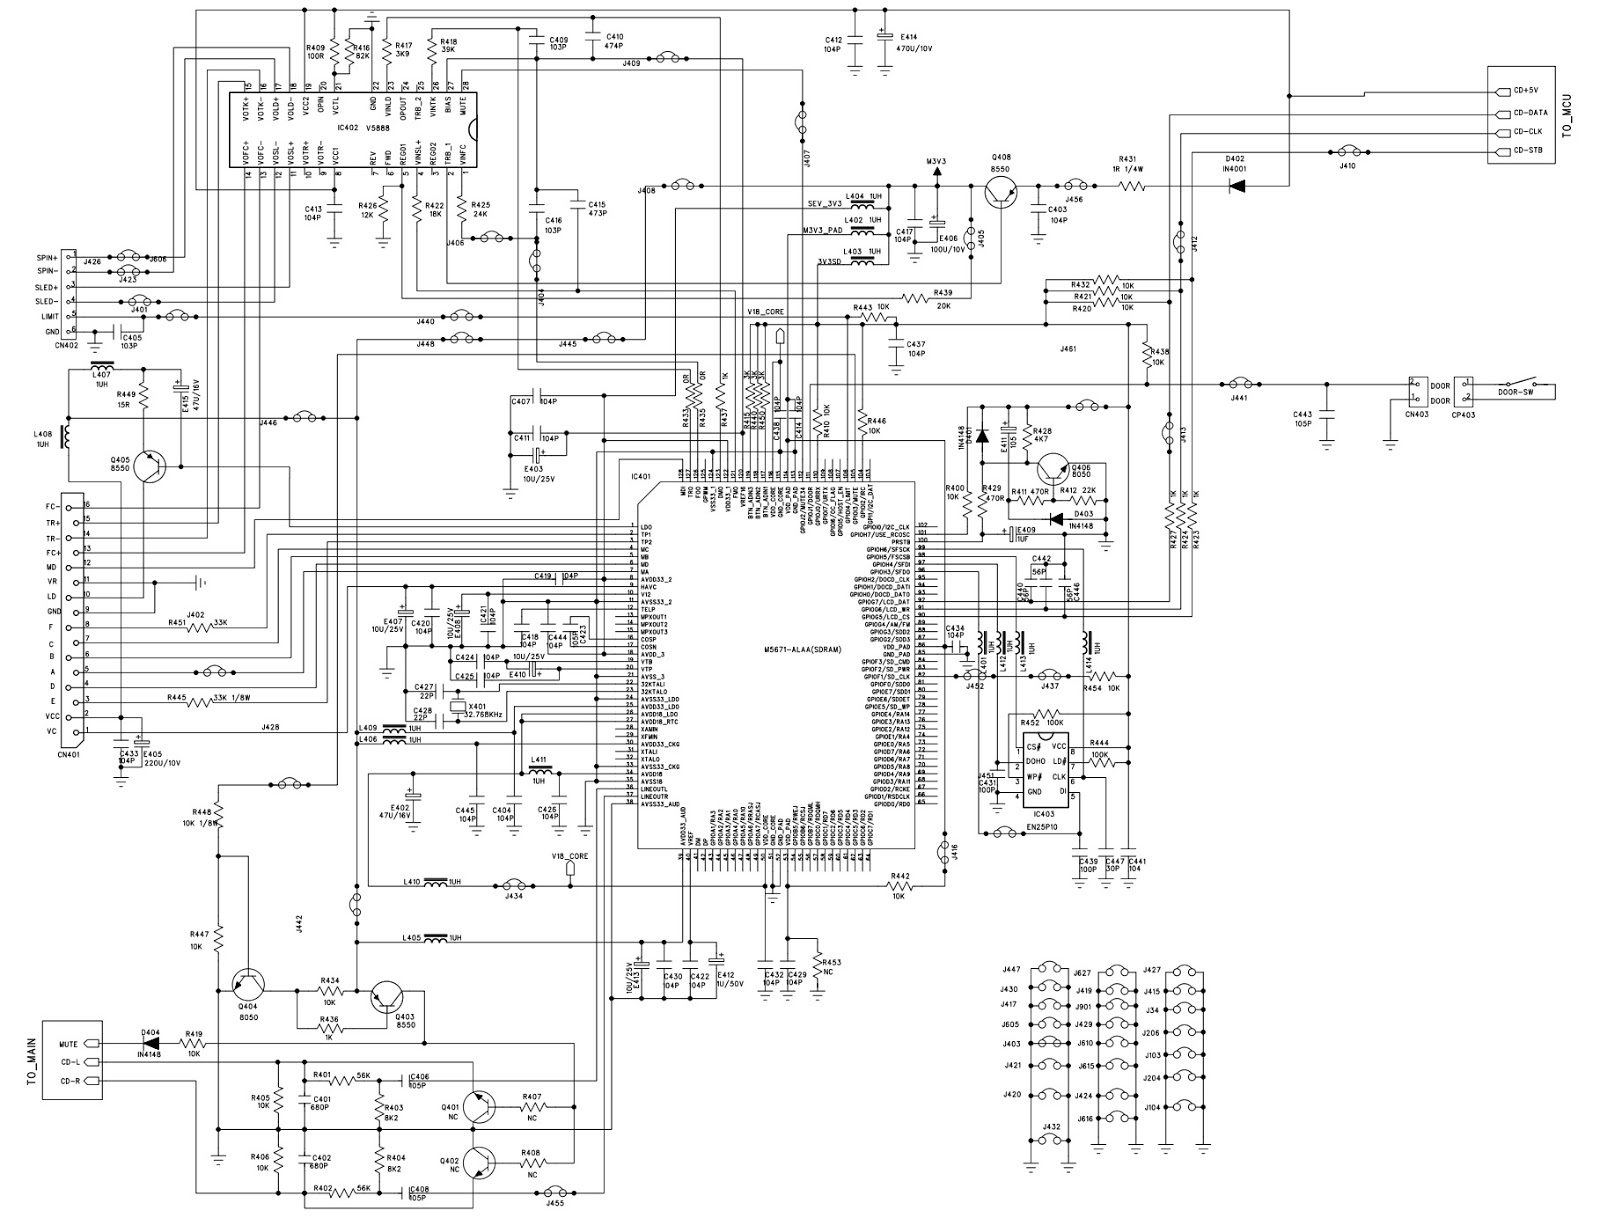 manguonblog: Britania micro system BS370 schematic